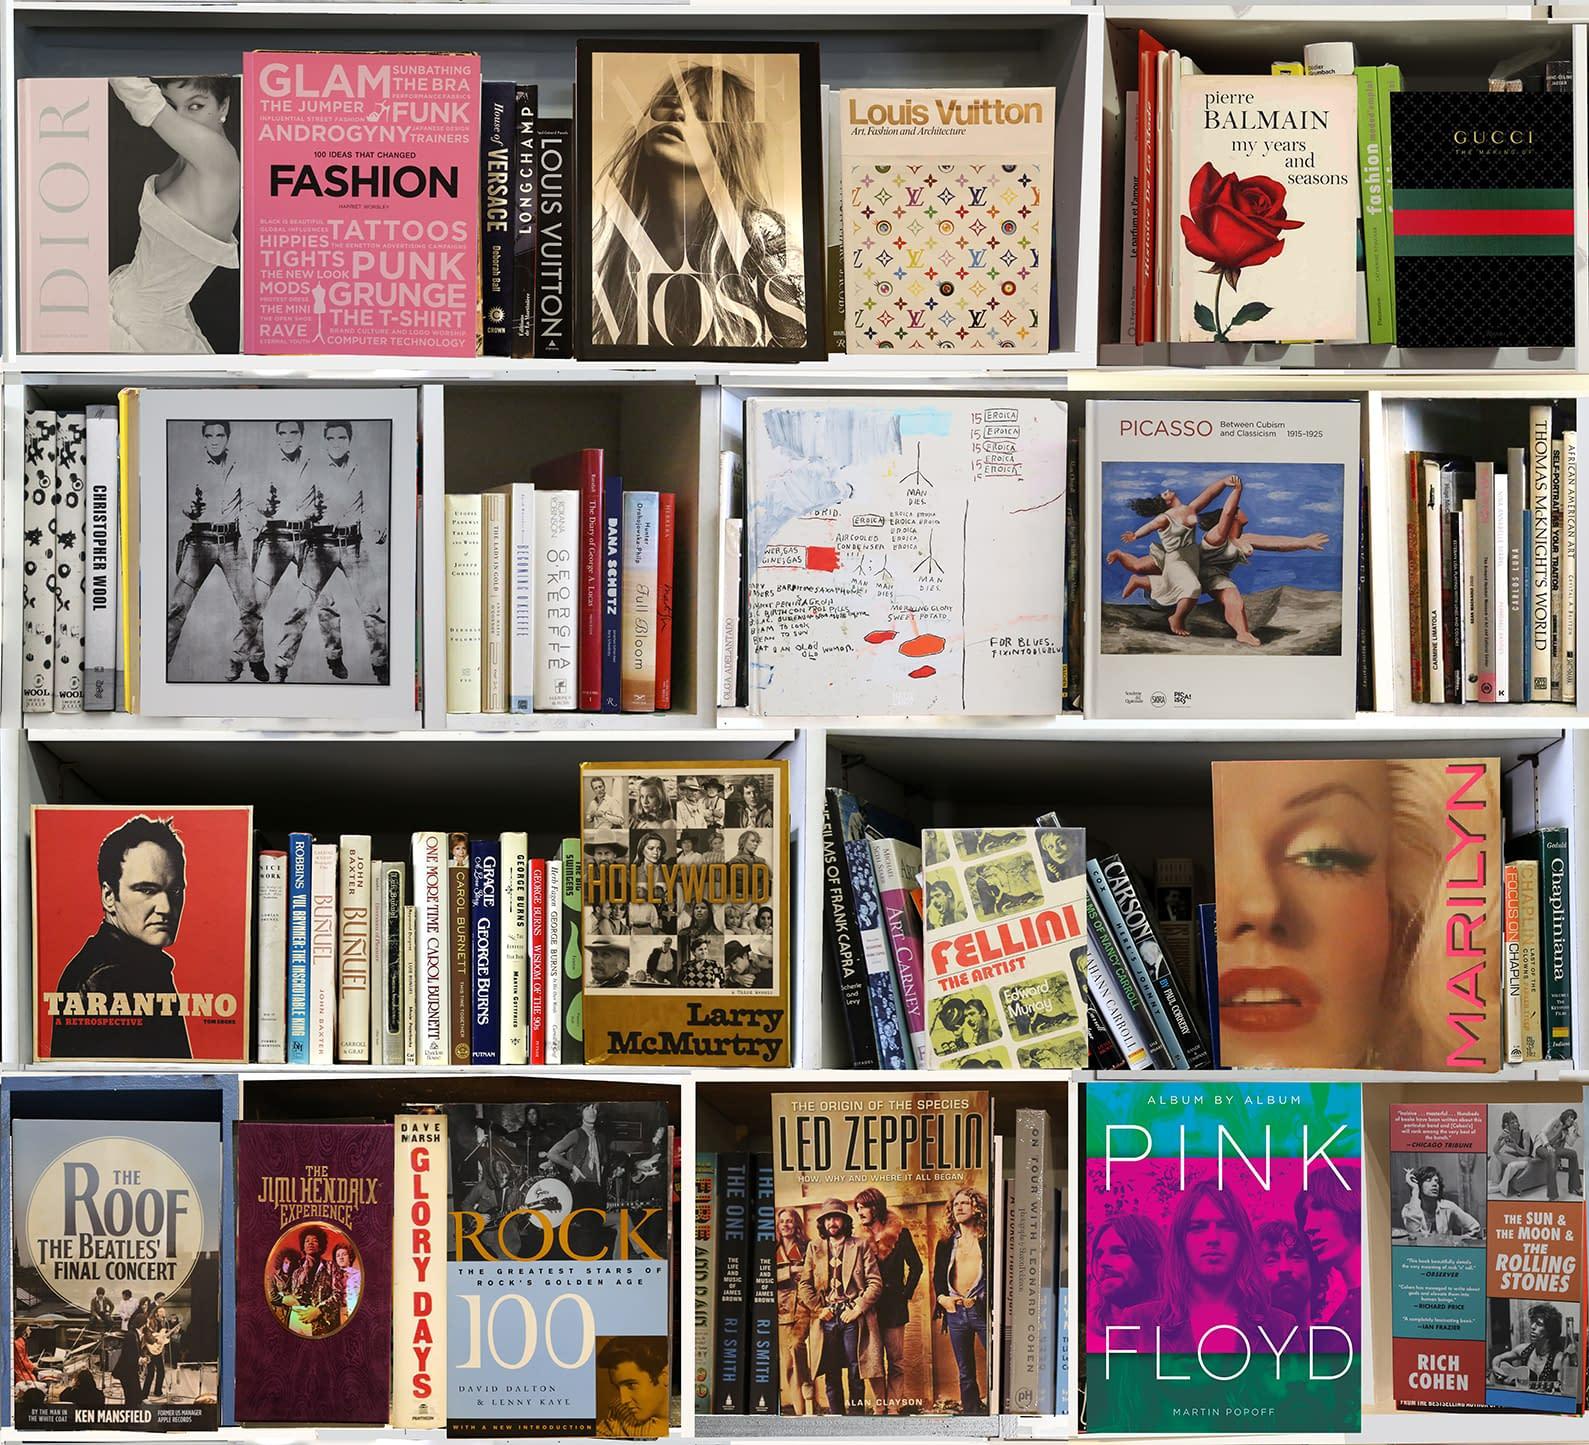 max steven grossman_fashion, music, rock, bookscape, photography, interiors, joanne artman gallery